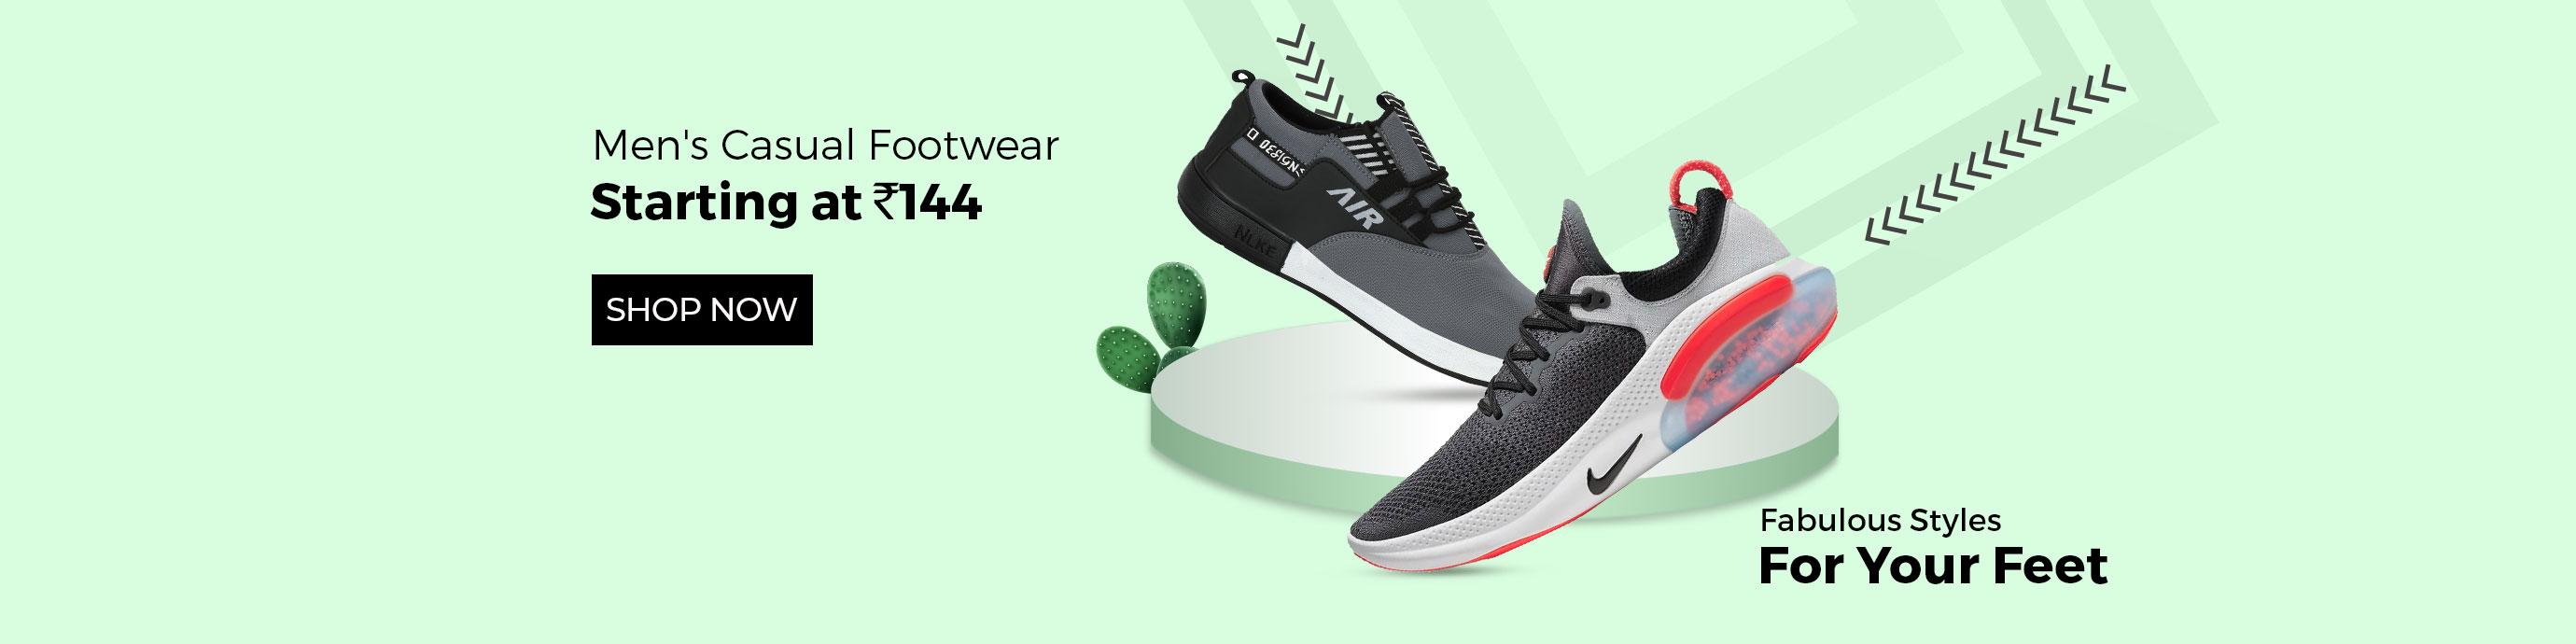 ShopClues.com - Men's footwear starting at just ₹144